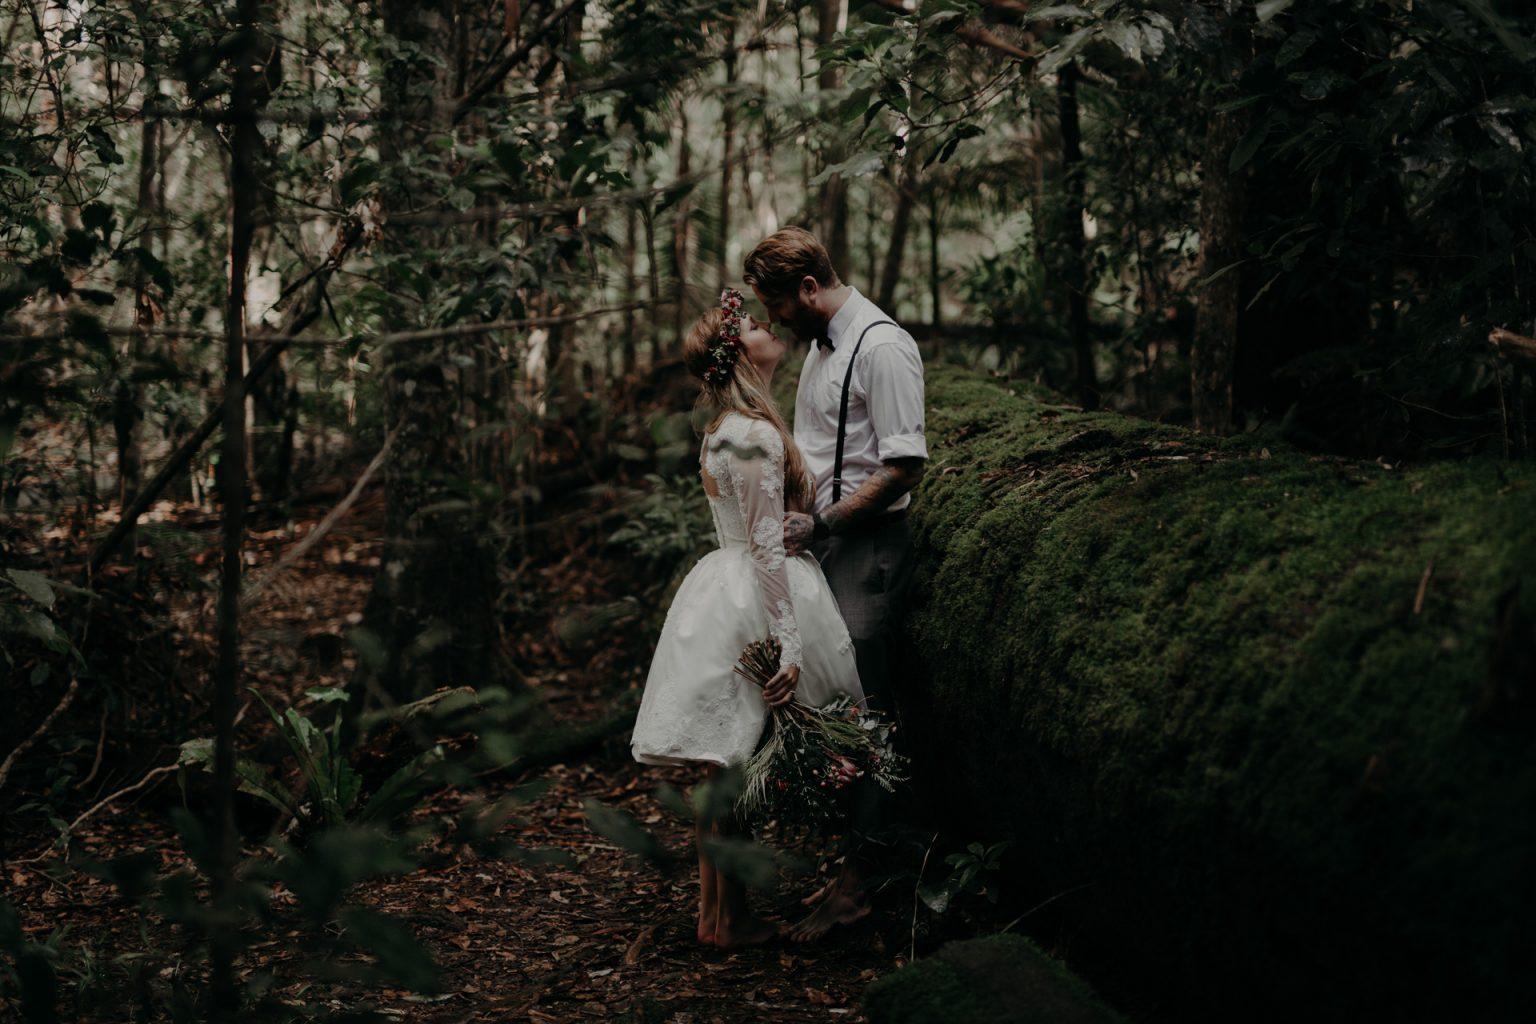 bride groom forest kiss moss tree trunk